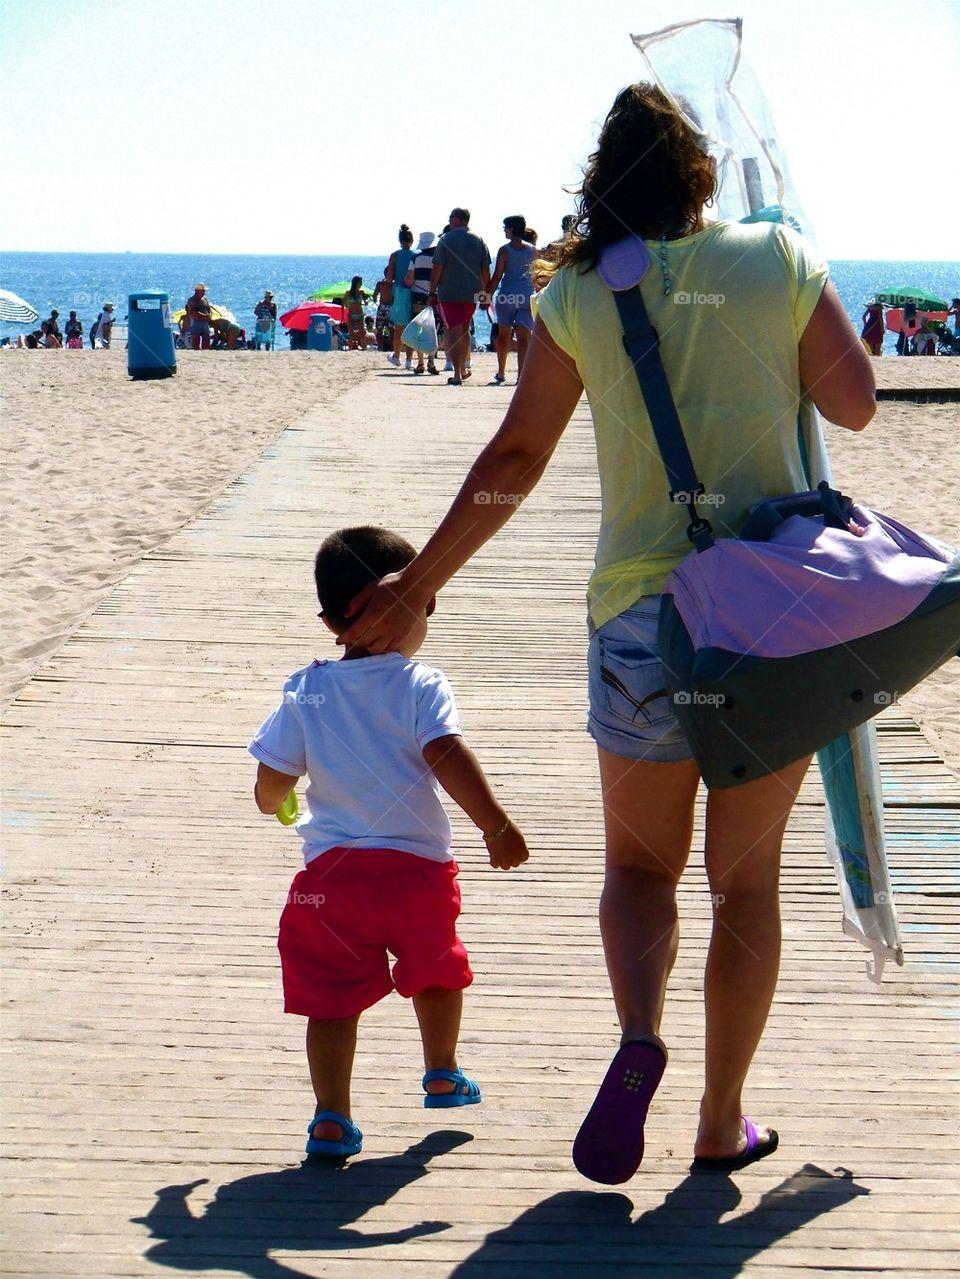 Taking a walk to the beach